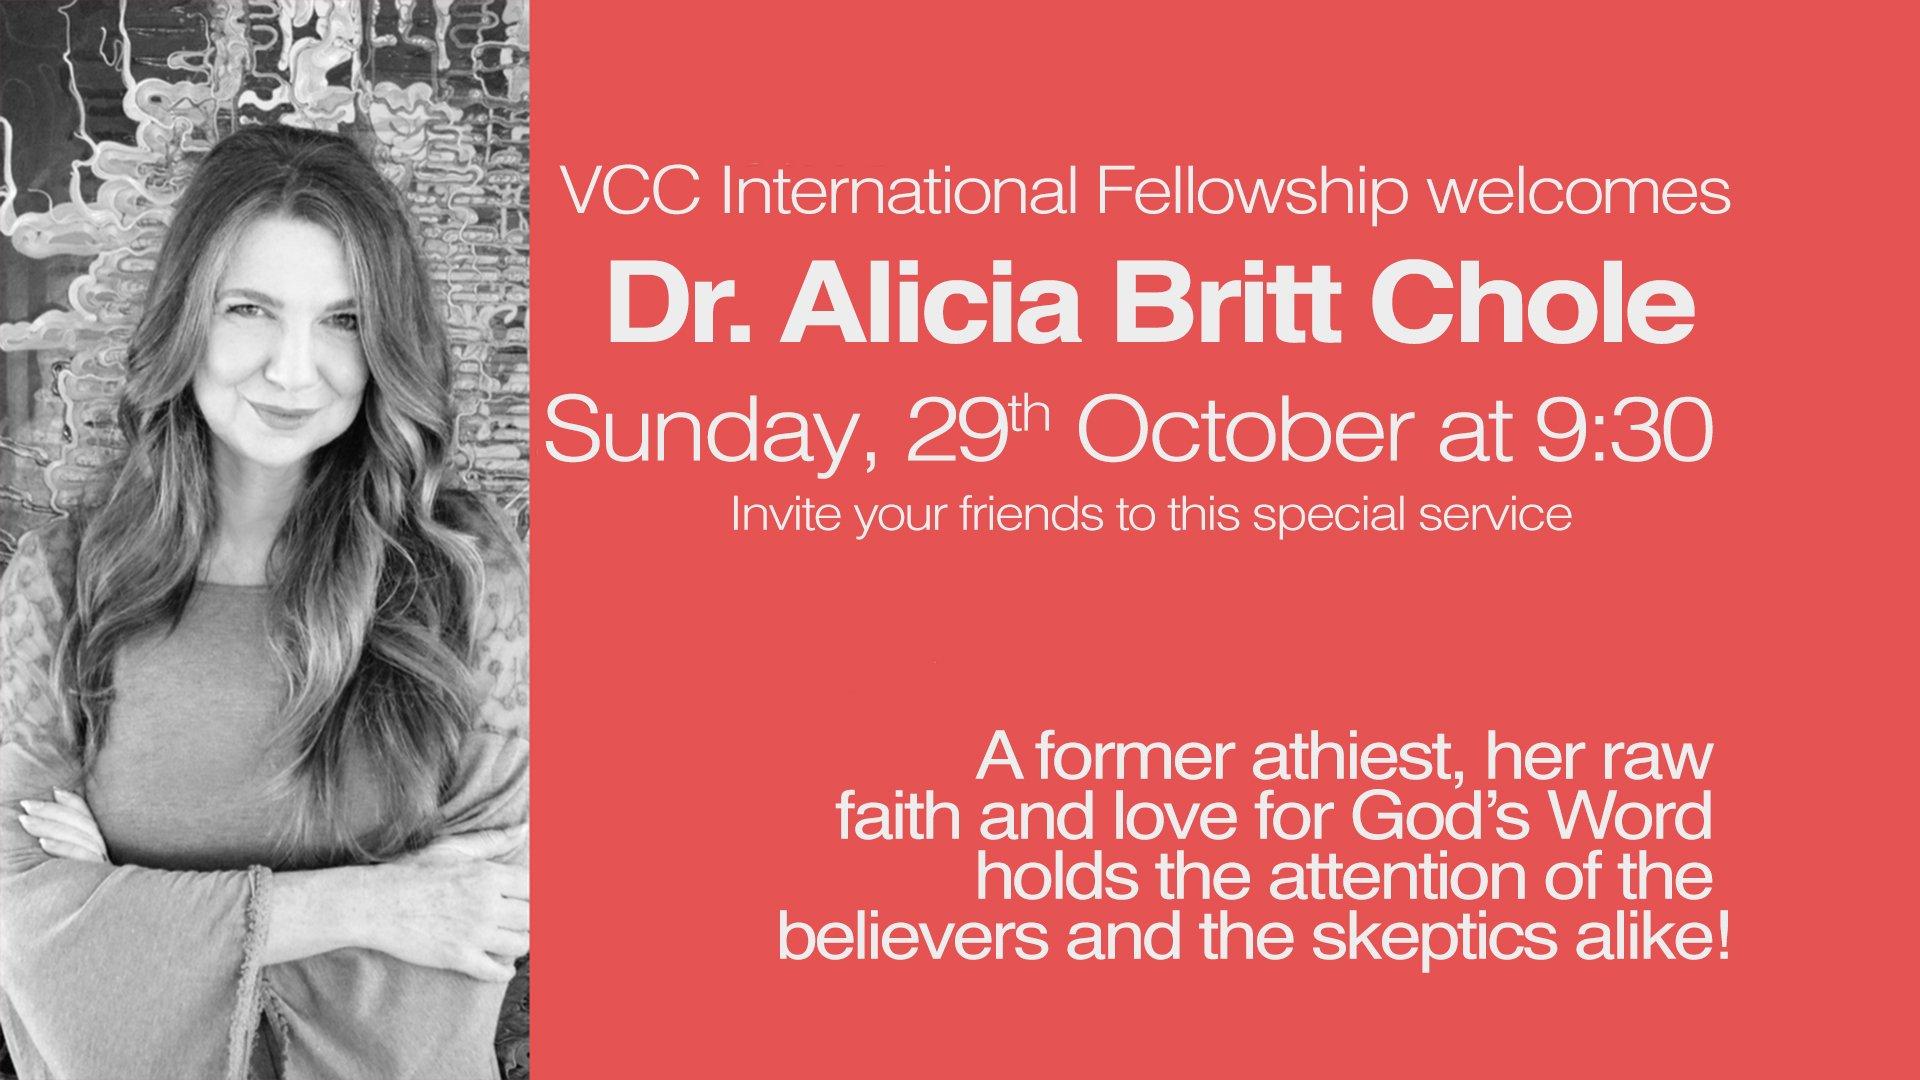 Alicia Britt Chole